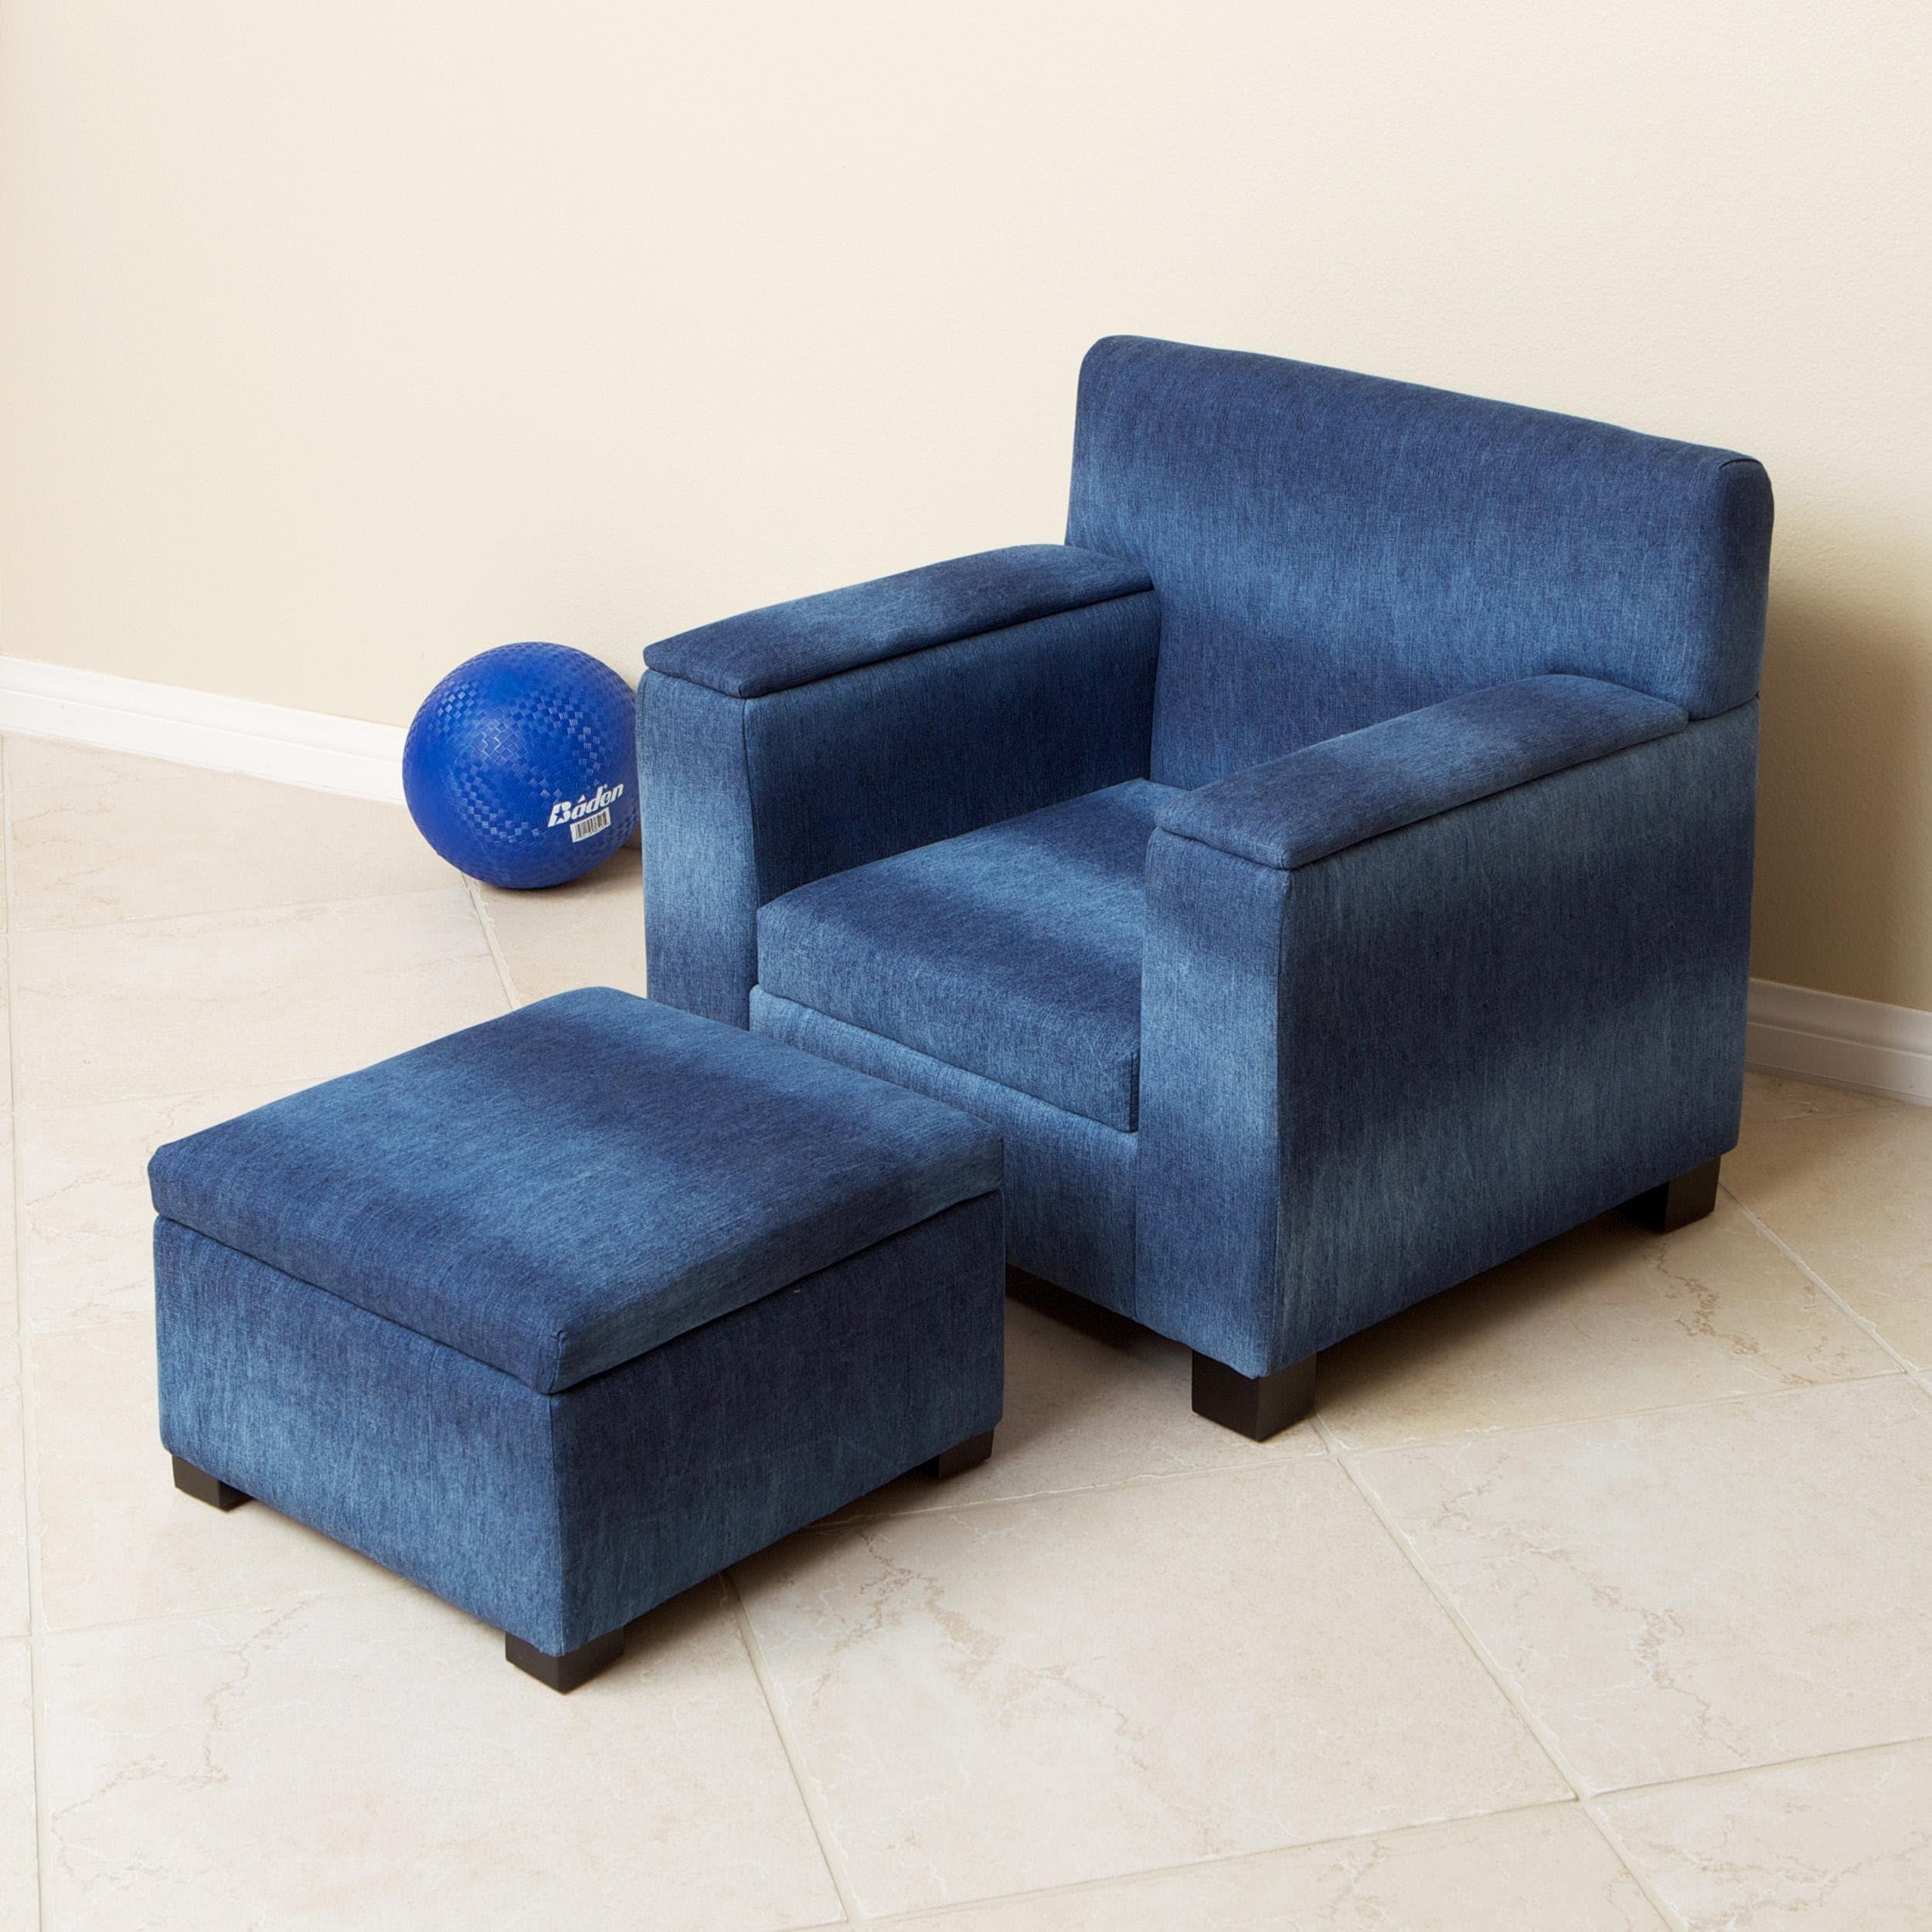 Super Blue Denim Fabric Kids Club Chair And Ottoman Set Creativecarmelina Interior Chair Design Creativecarmelinacom